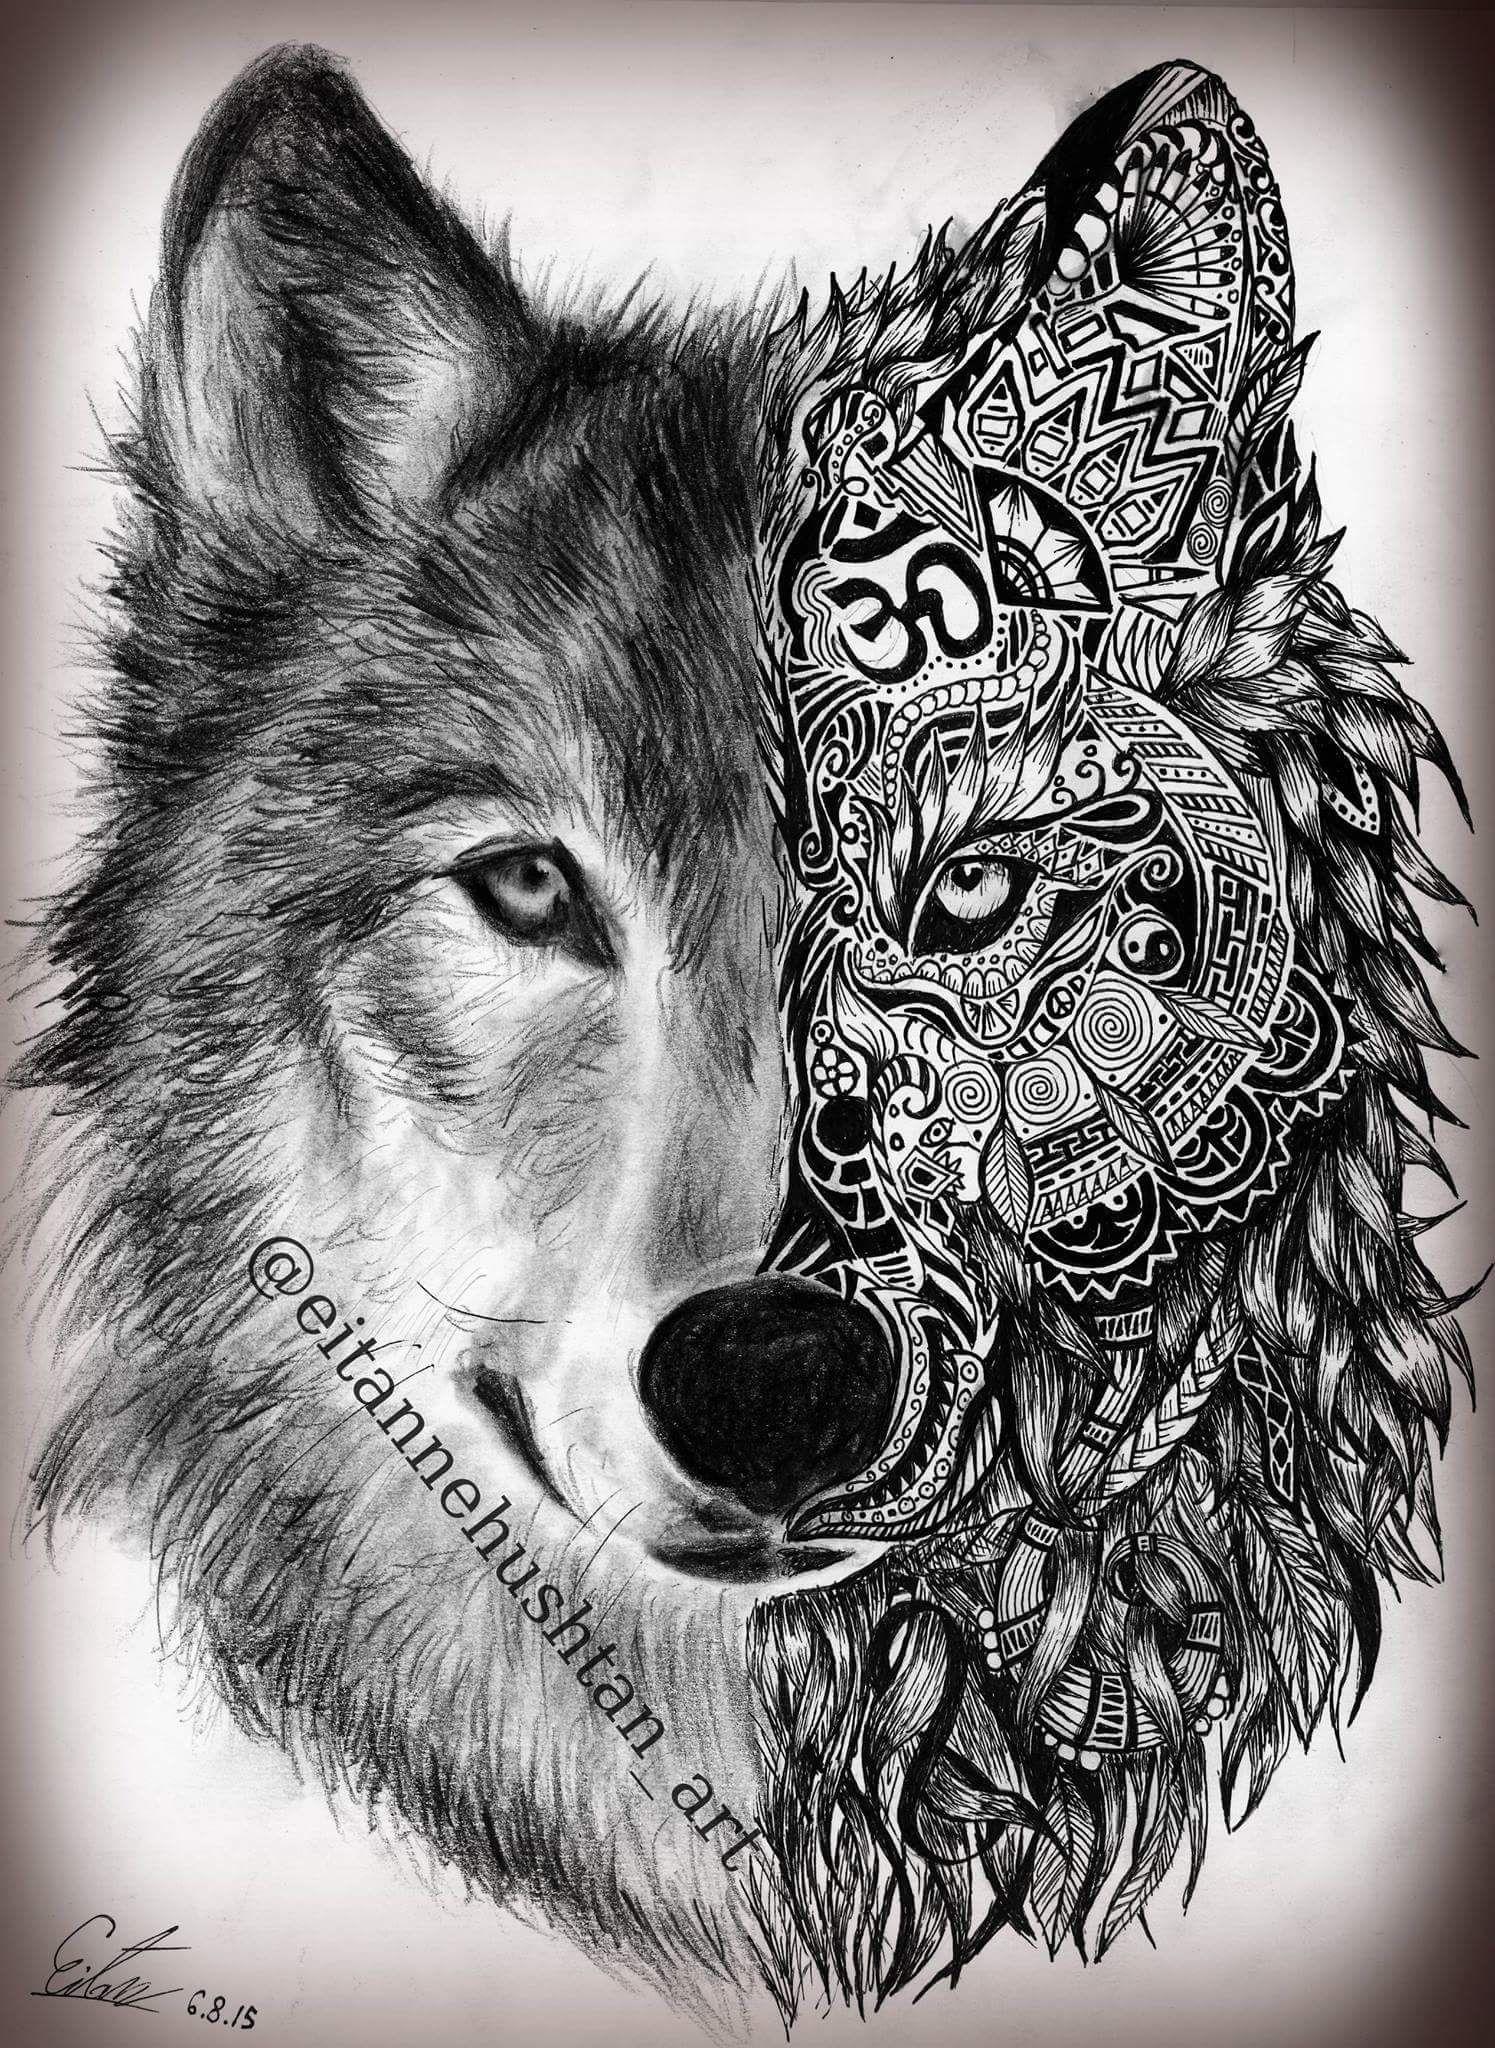 Pin von Jëssië Megginson auf Lovable Art | Pinterest | Tattoo ideen ...